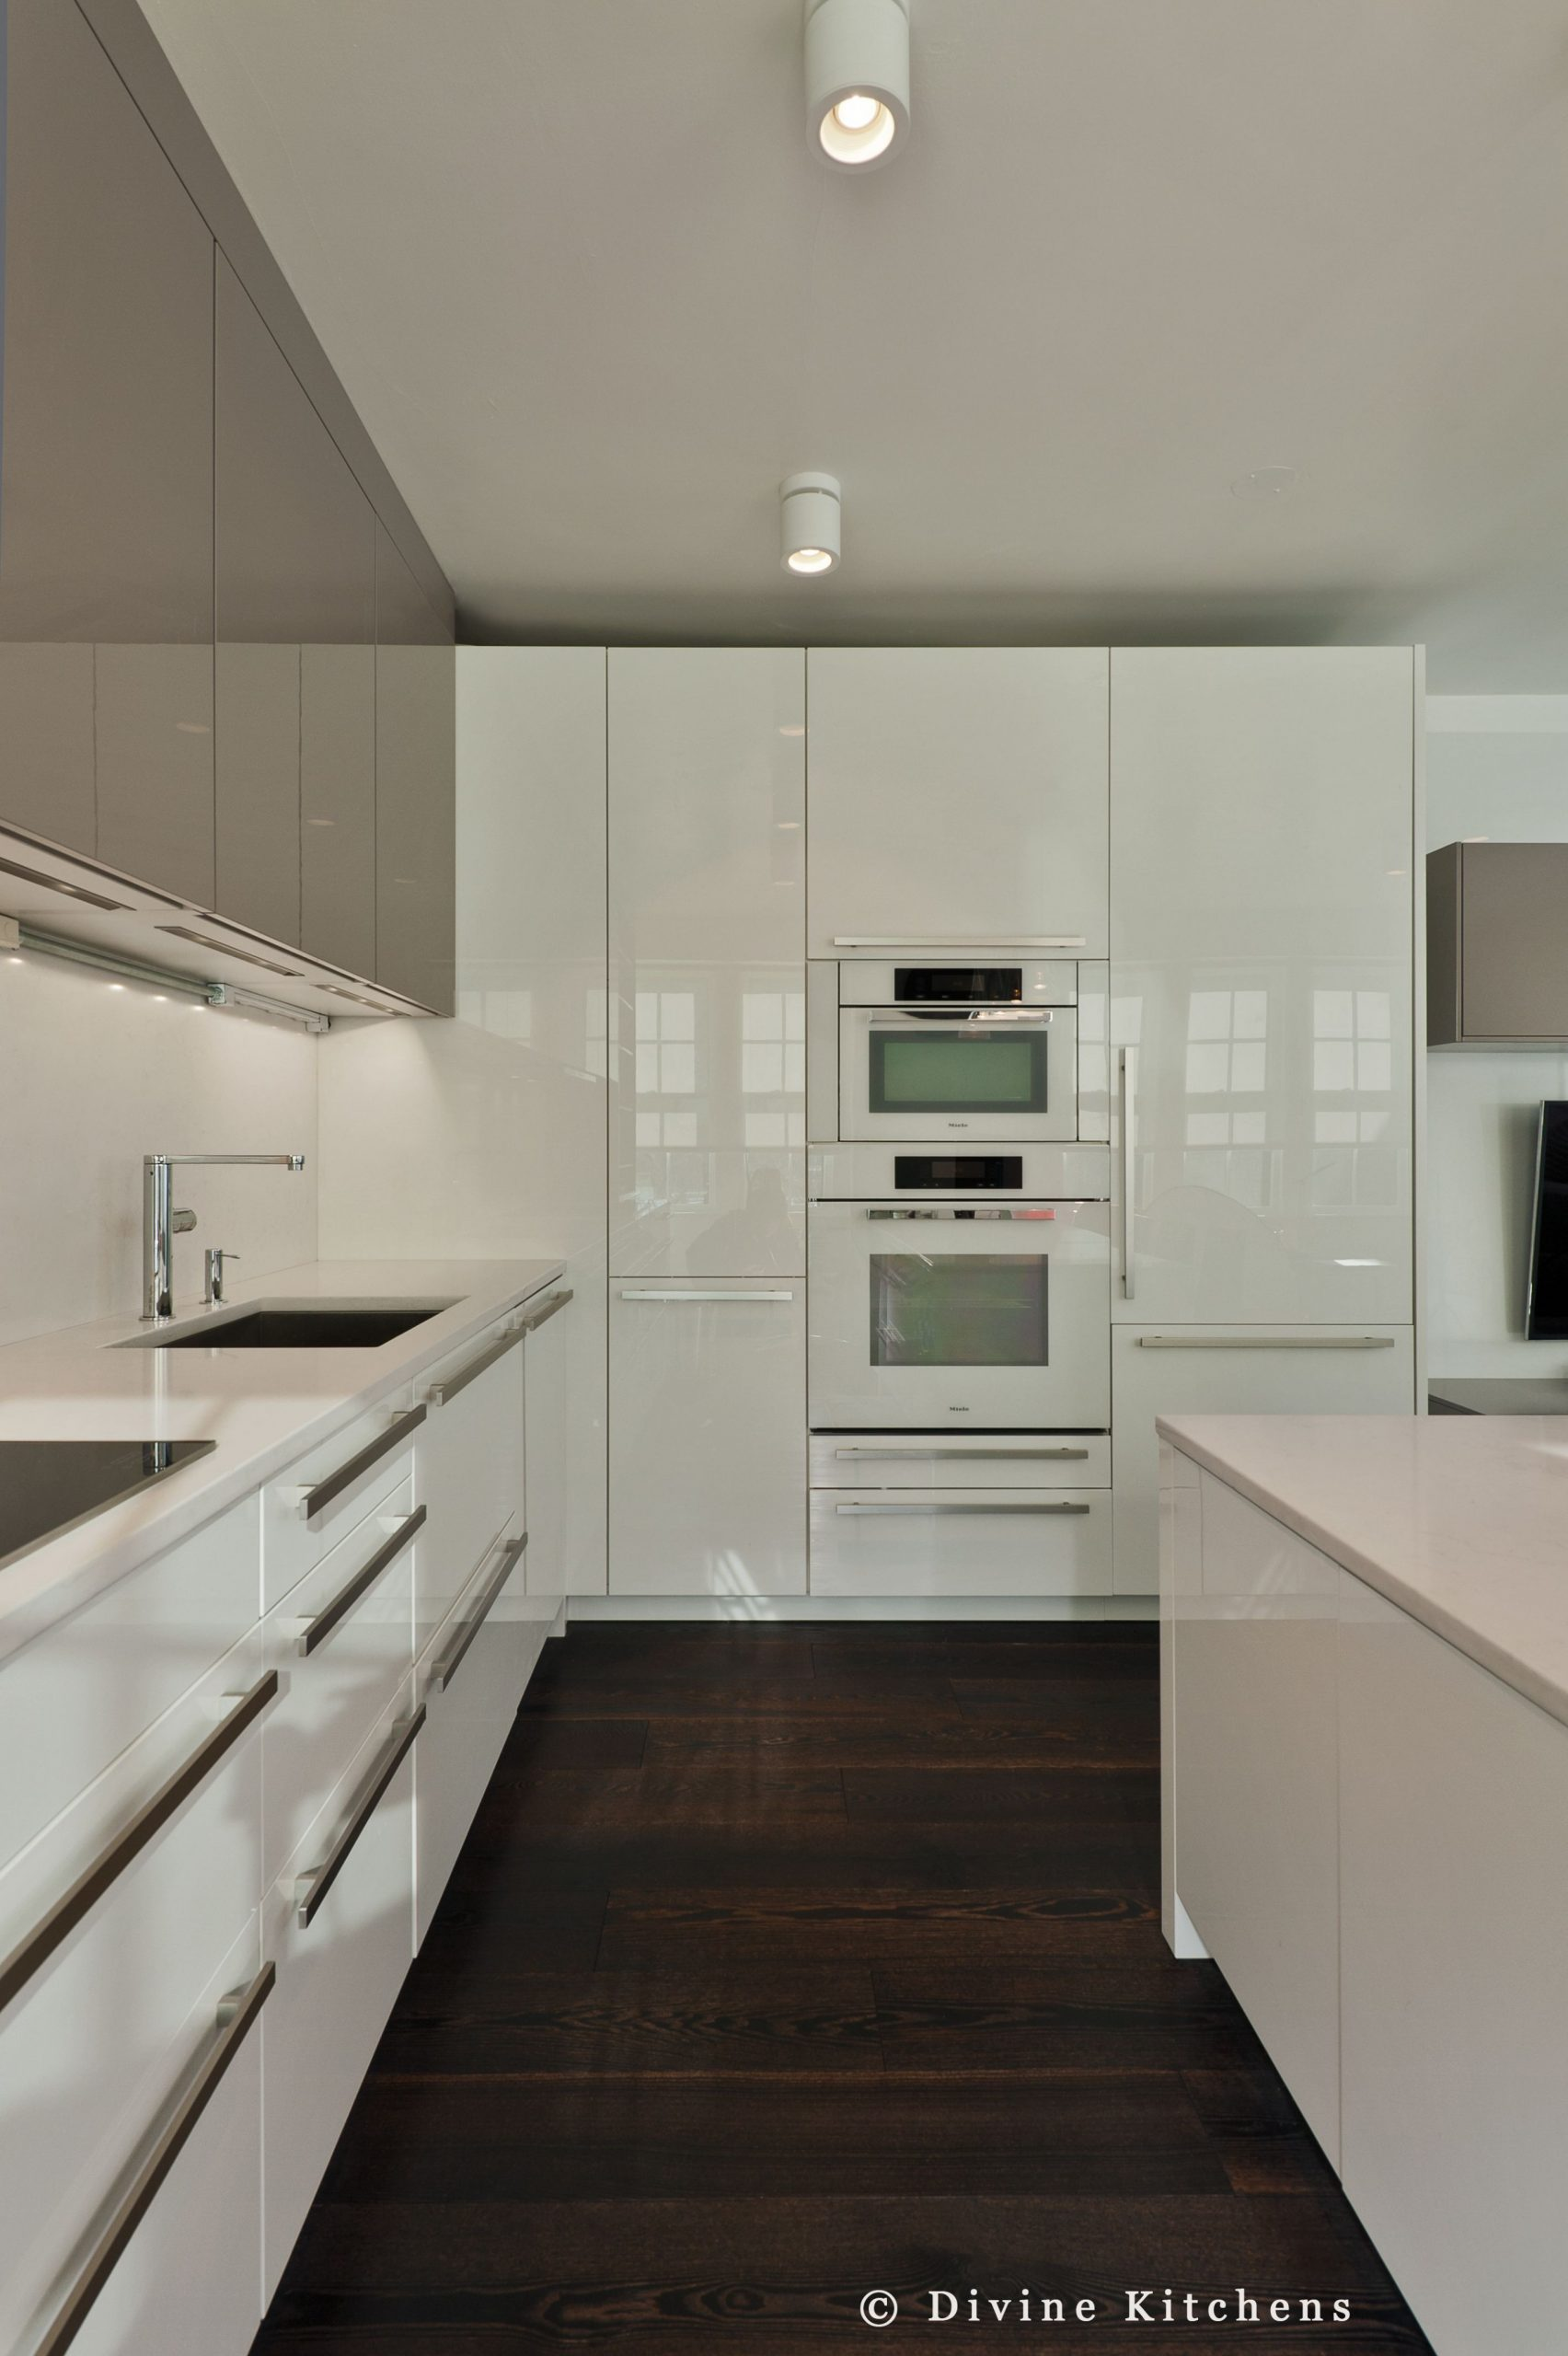 Boston modern kitchen. White and gray cabinets